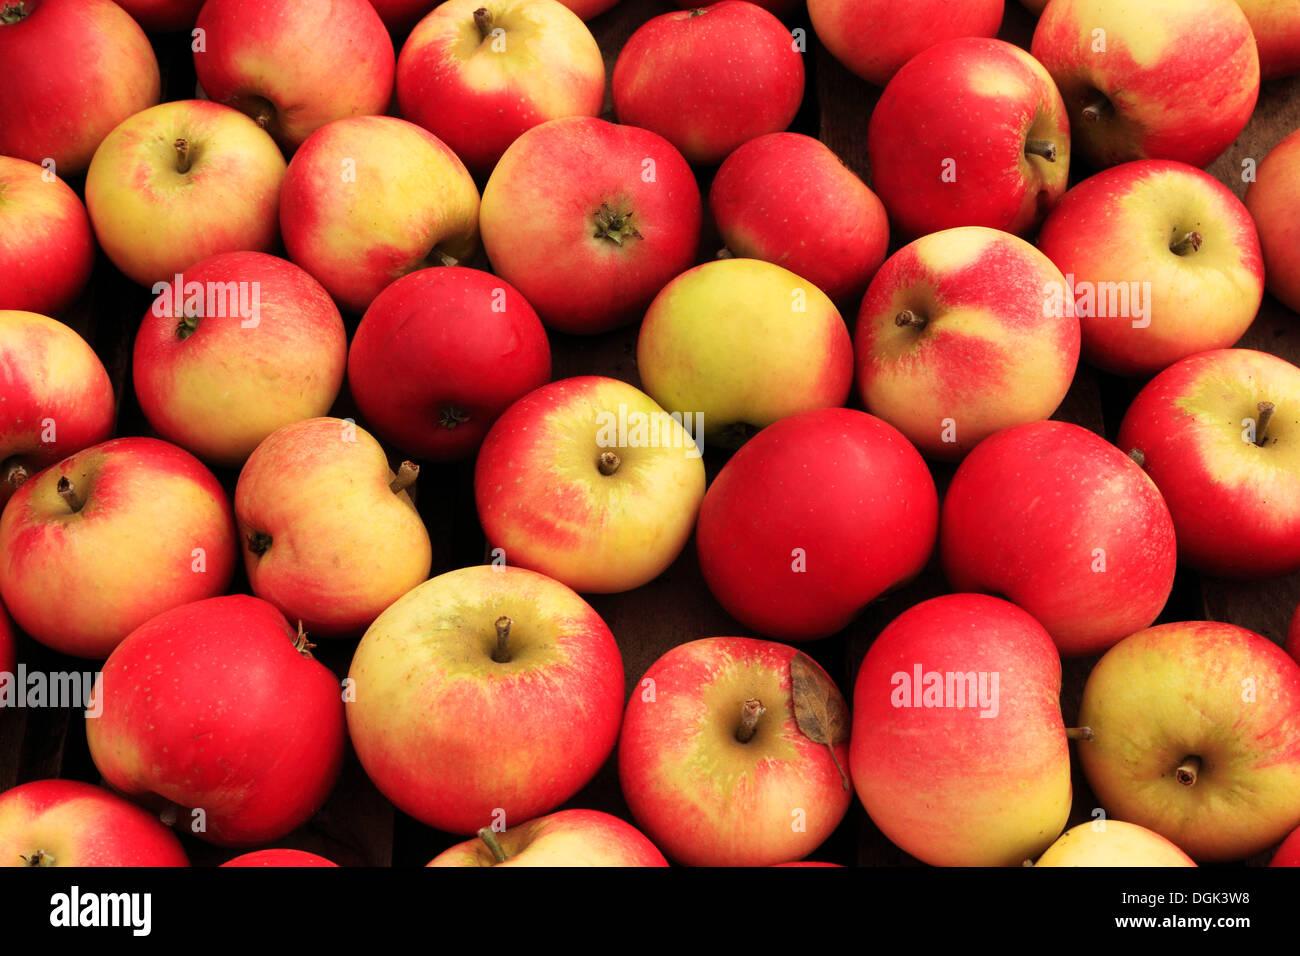 Apple 'scoperta', malus domestica, mele varietà varietà in farm shop display Immagini Stock